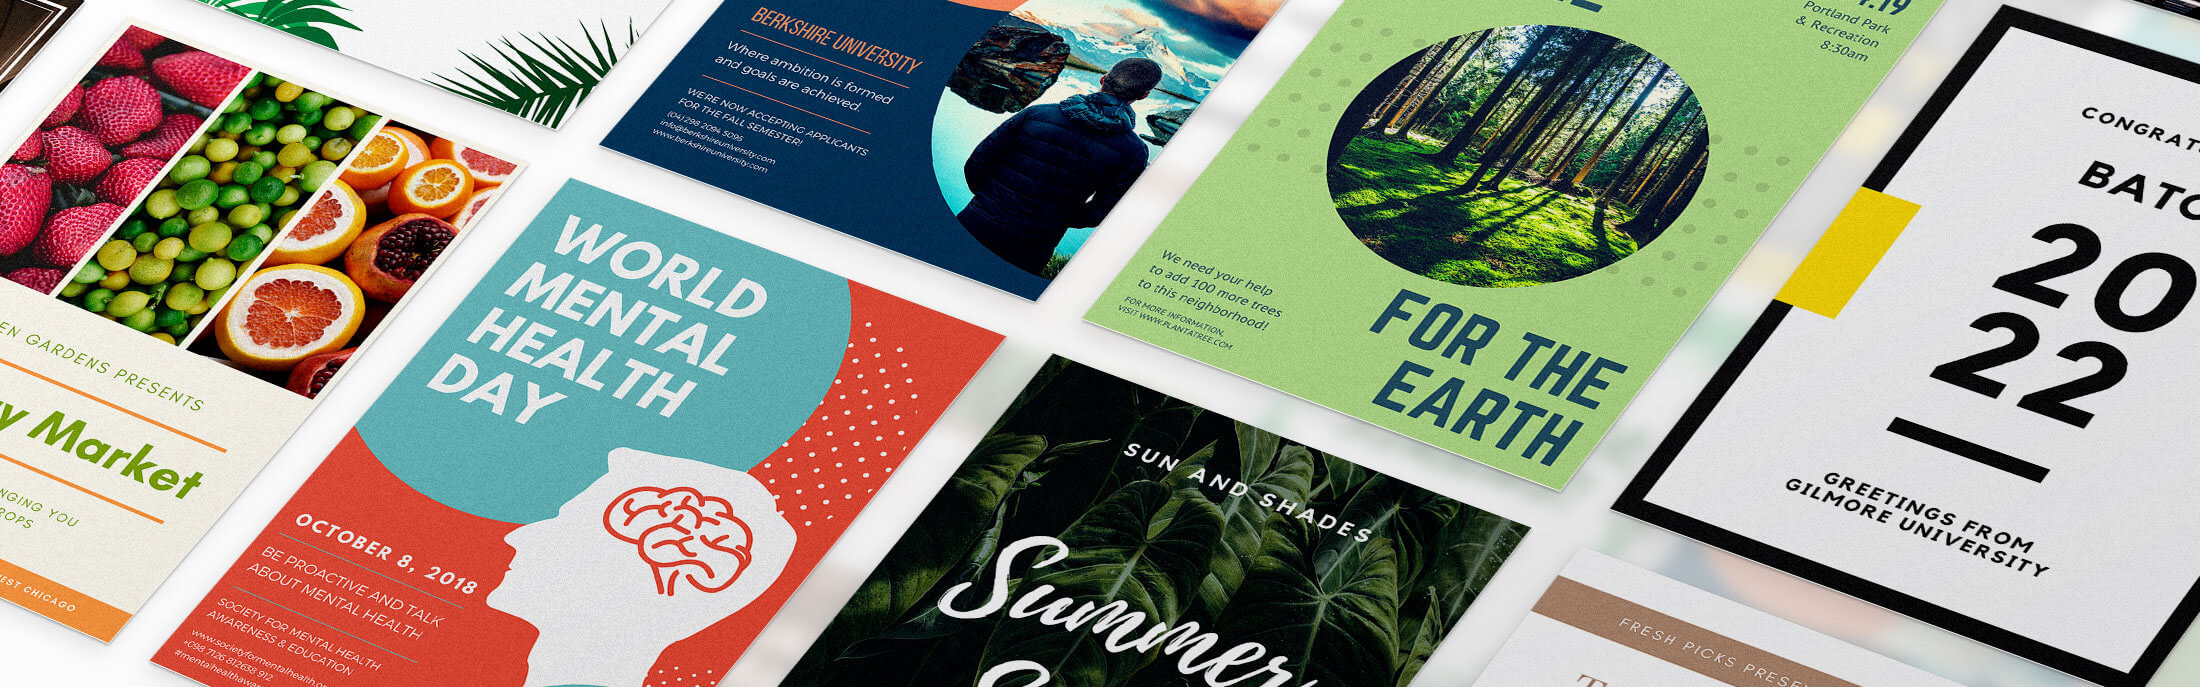 Free Vector Summer Festival Poster Template 2